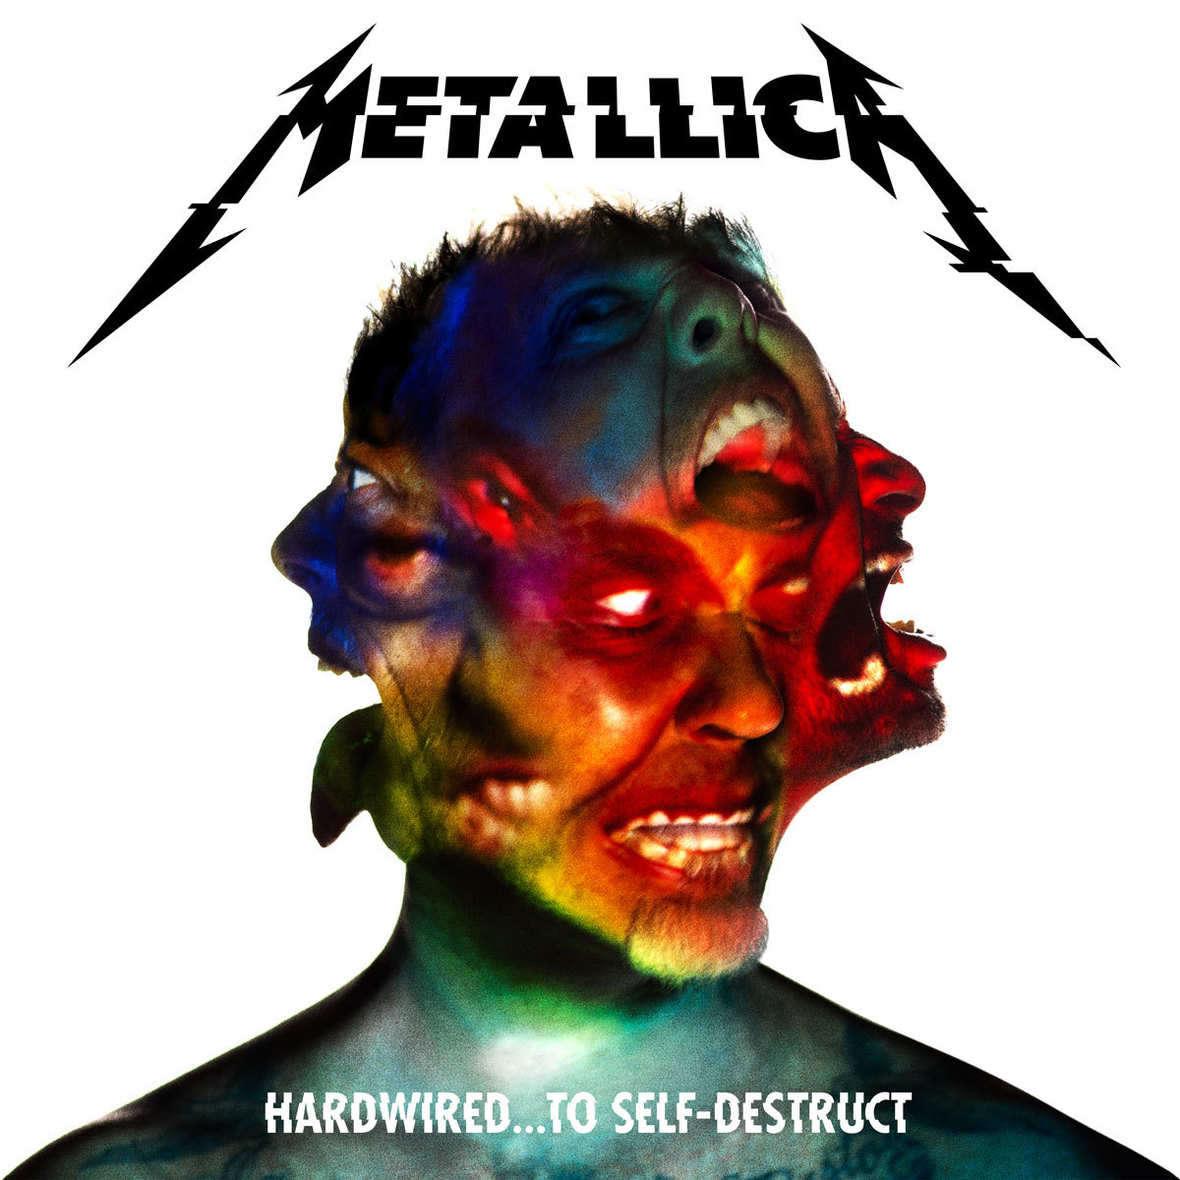 Metallica -  HARDWIRED... TO SELF-DESTRUCT [RECENZJA] - full image